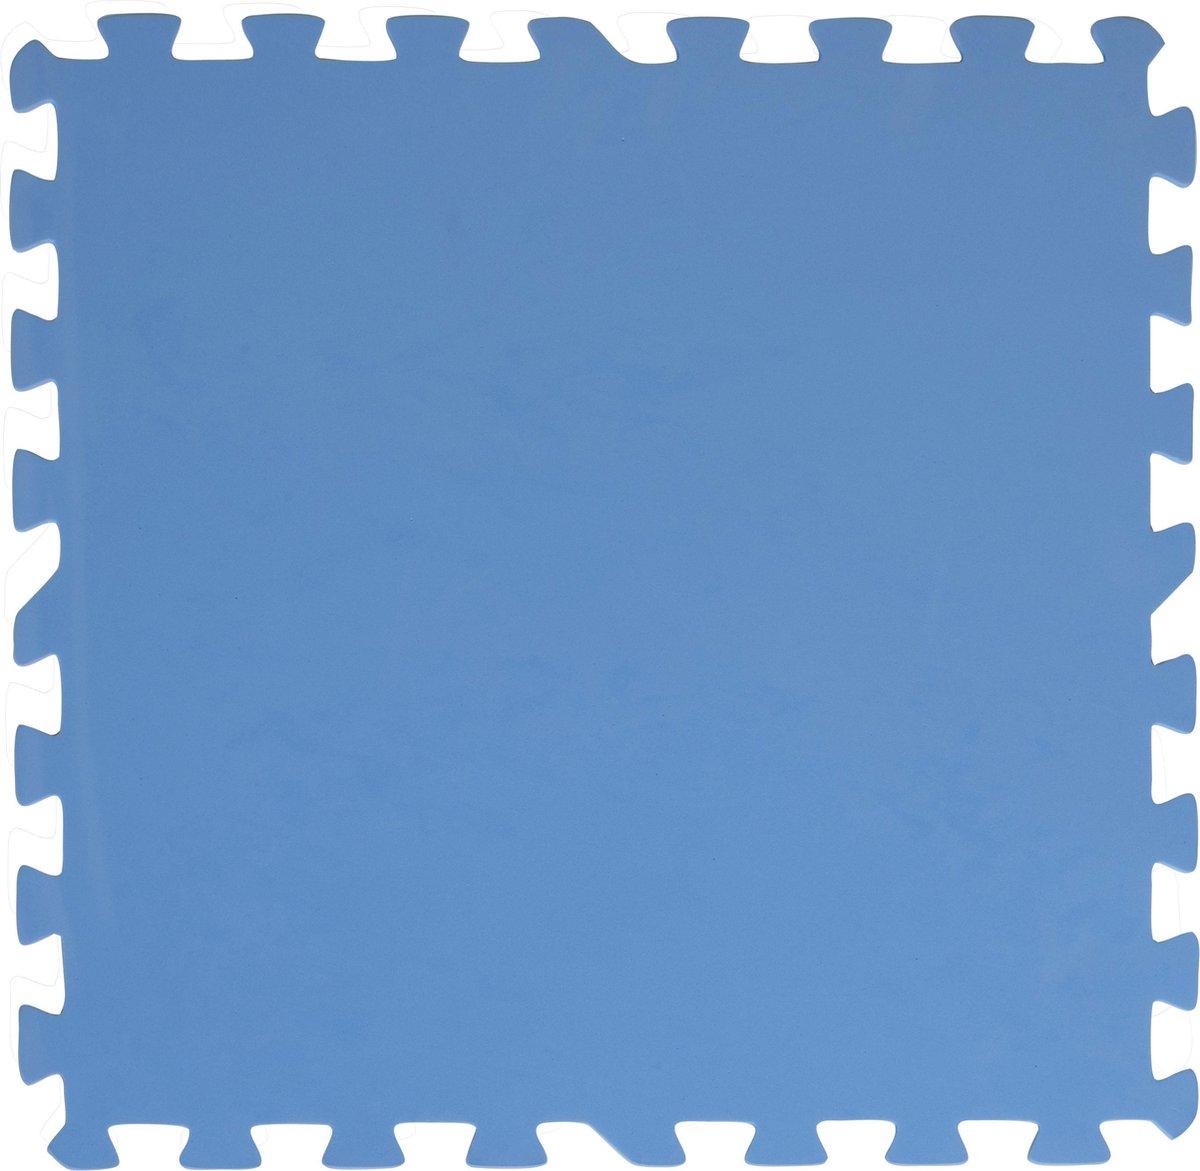 Creative Kids Zwembadtegels - Foam - 50x50 - 8 Stuks - 2m2 - Blauw